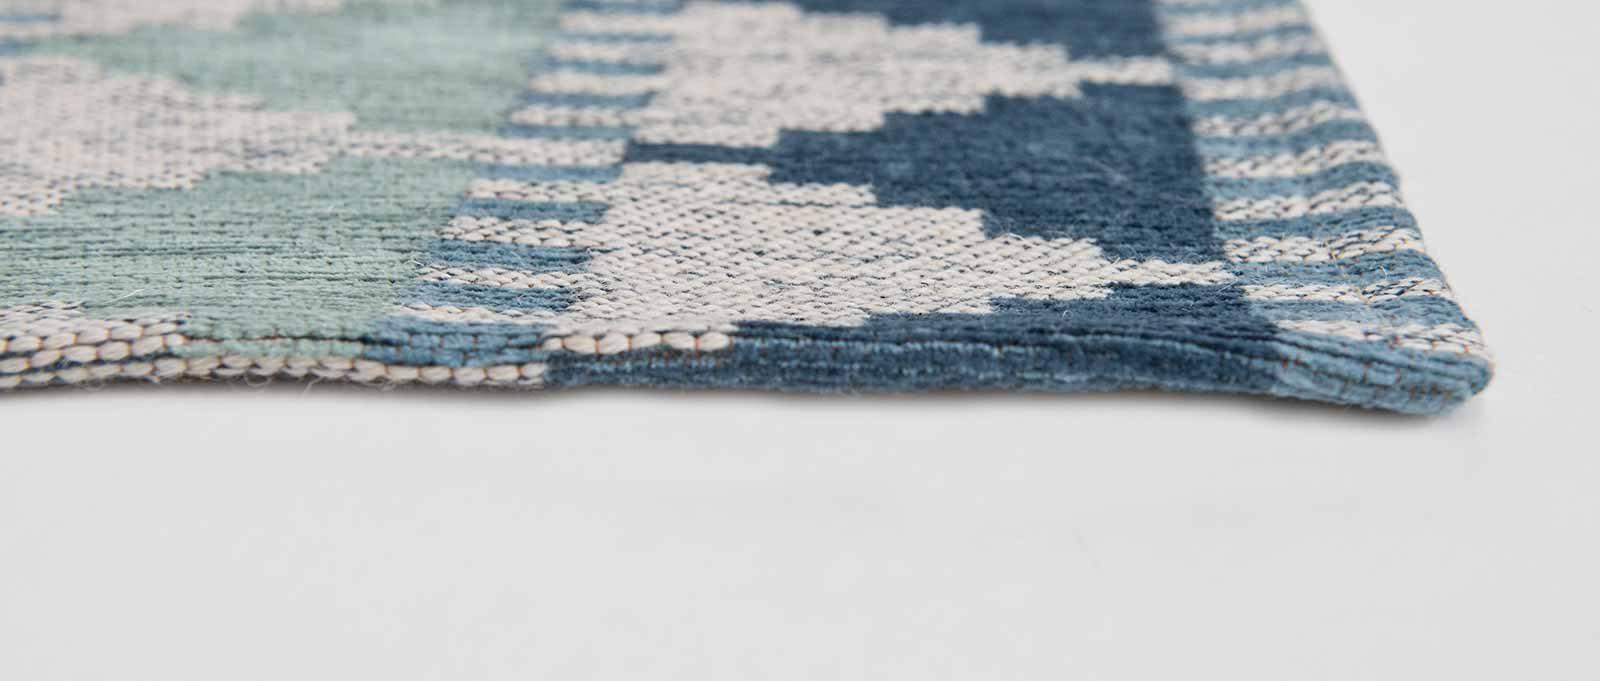 Louis De Poortere alfombras Villa Nova LX 8766 Tobi Teal side